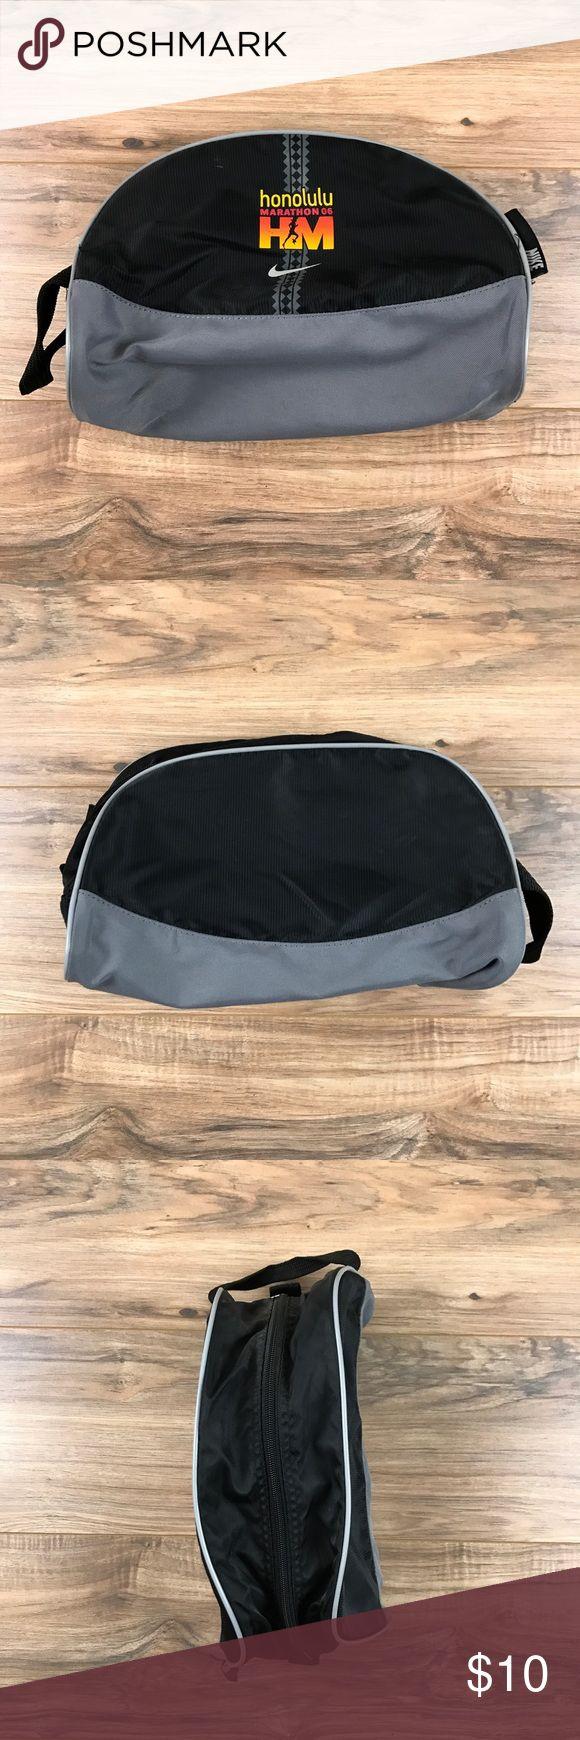 Nike Tote Bag Nike Honolulu Marathon 06 tote bag. Great condition. Like new. Nike Bags